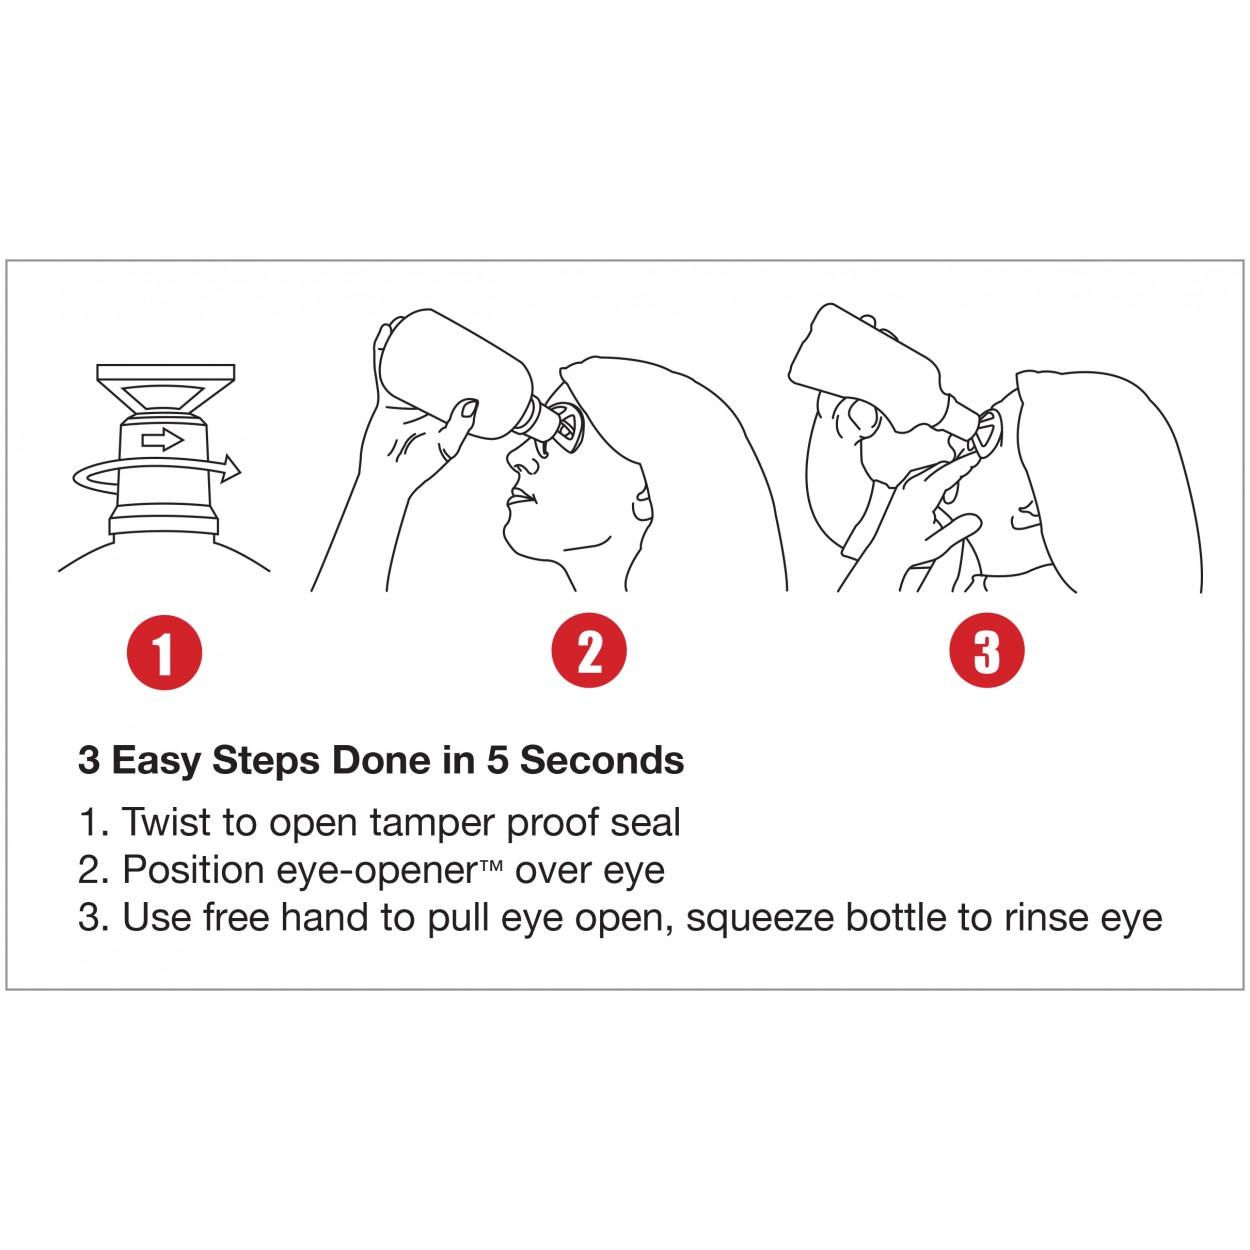 Eyewash Usage Instructions